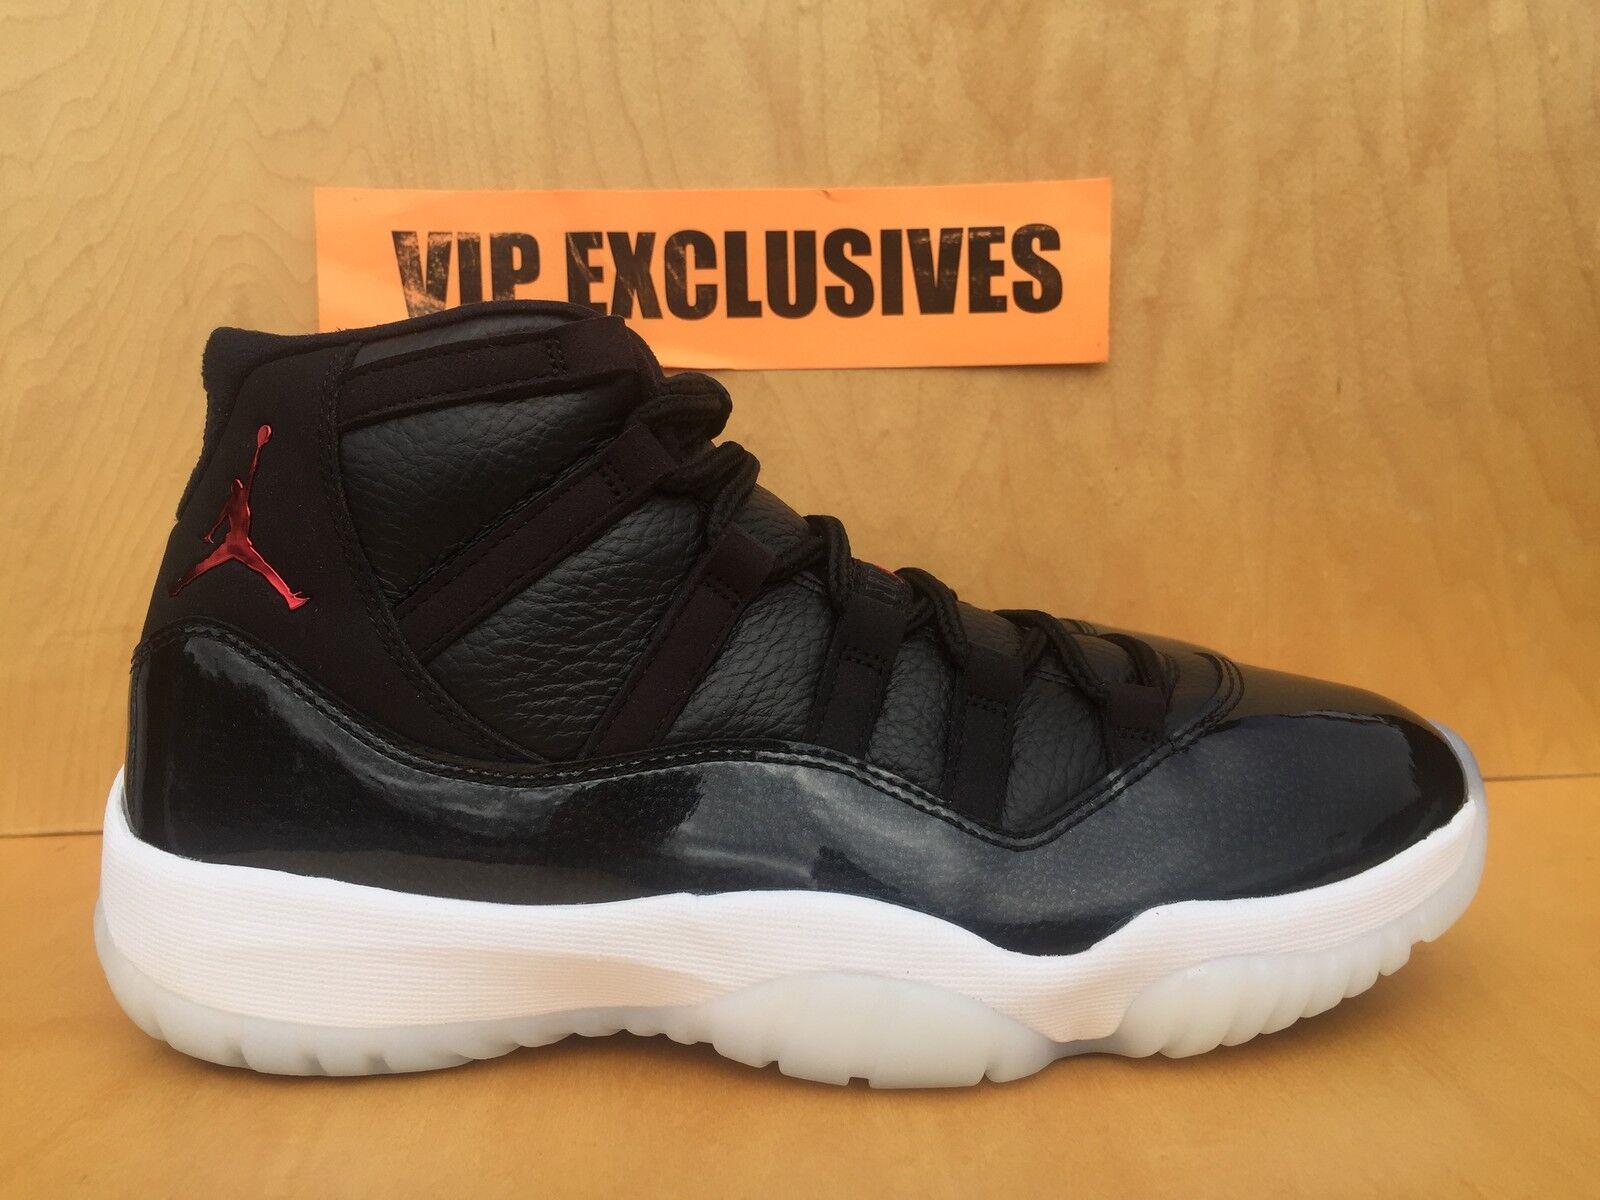 Nike air jordan 11 retrò xi 72-10 72 10 nero, bianco, rosso 378037-002 antracite